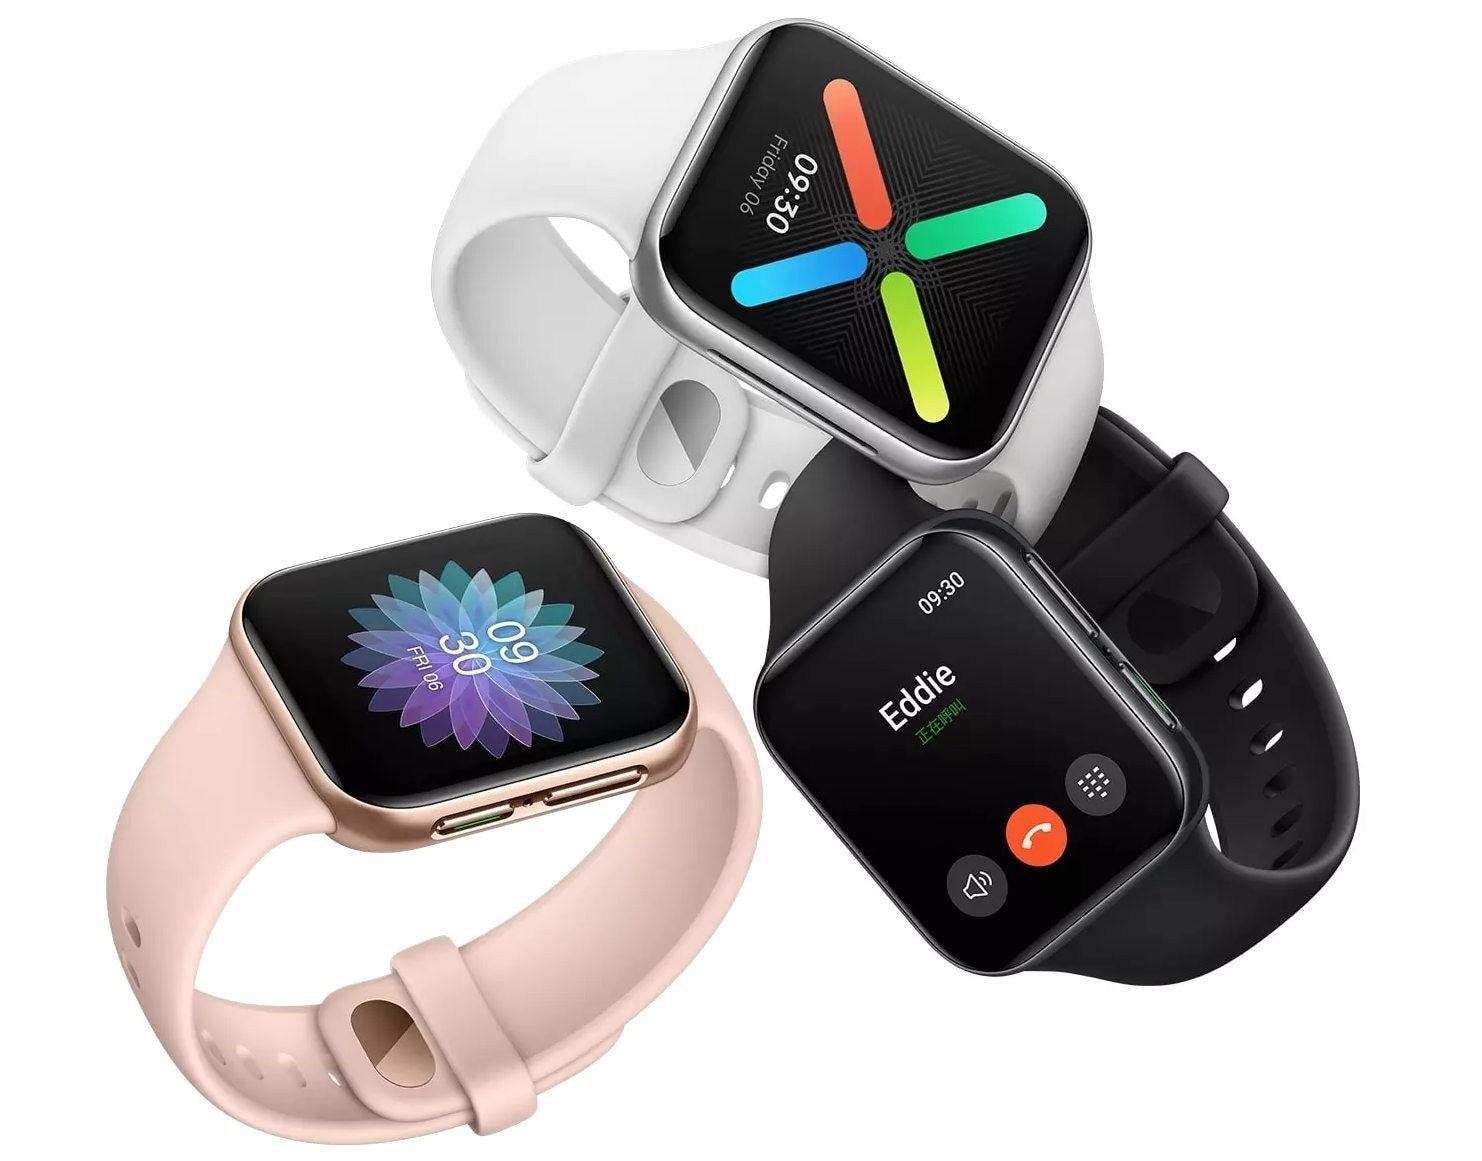 Oppo sta per lanciare una nuova variante del suo smartwatch con ECG, al debutto su Wear OS (foto)